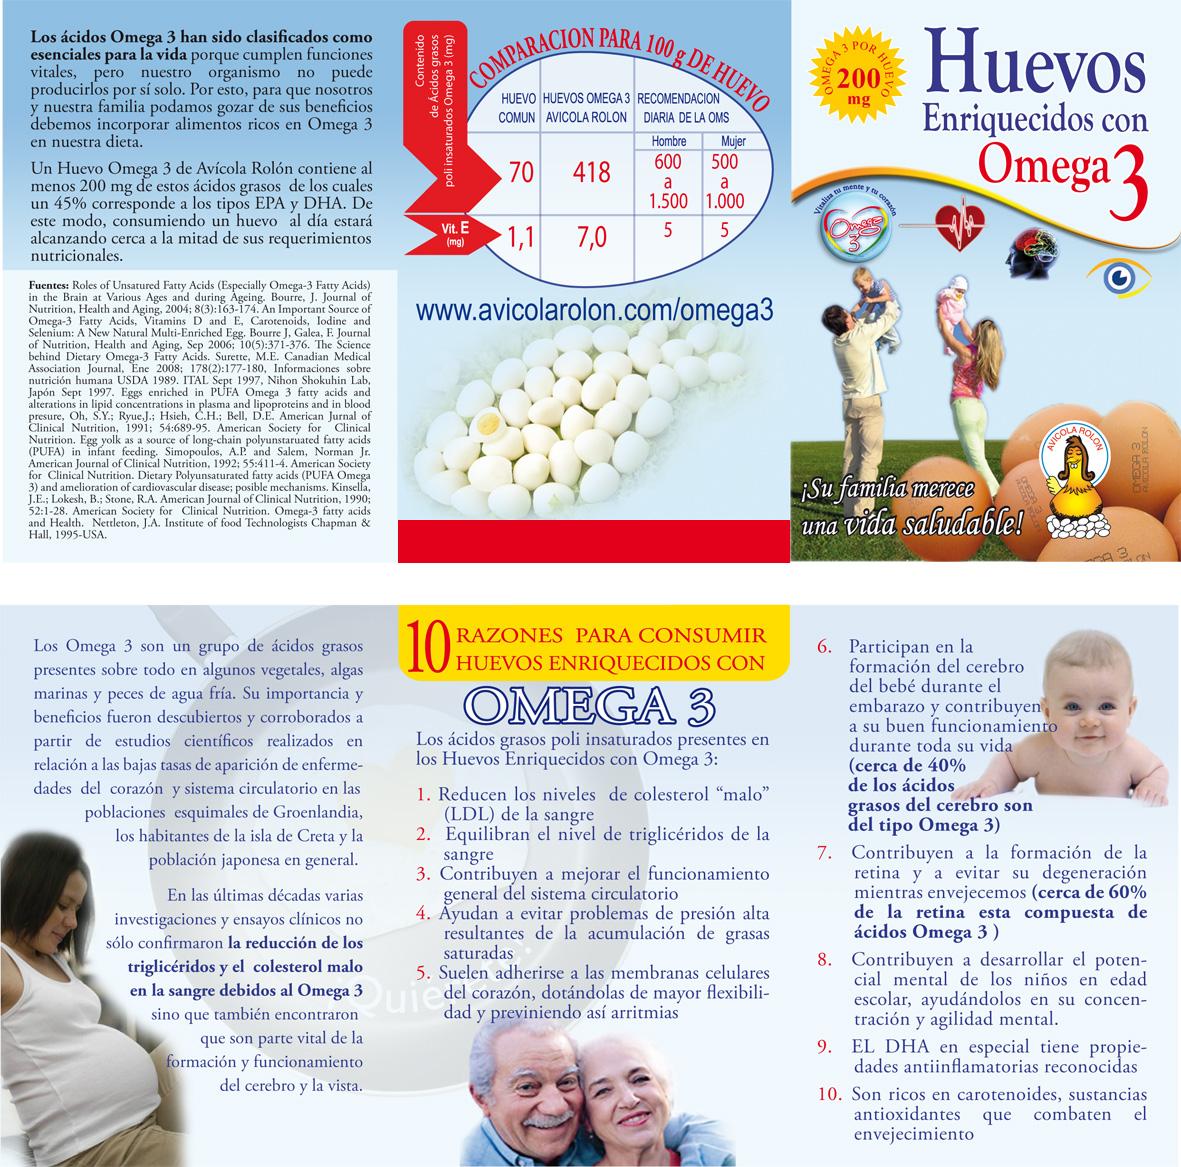 prospecto omega3 version12.png